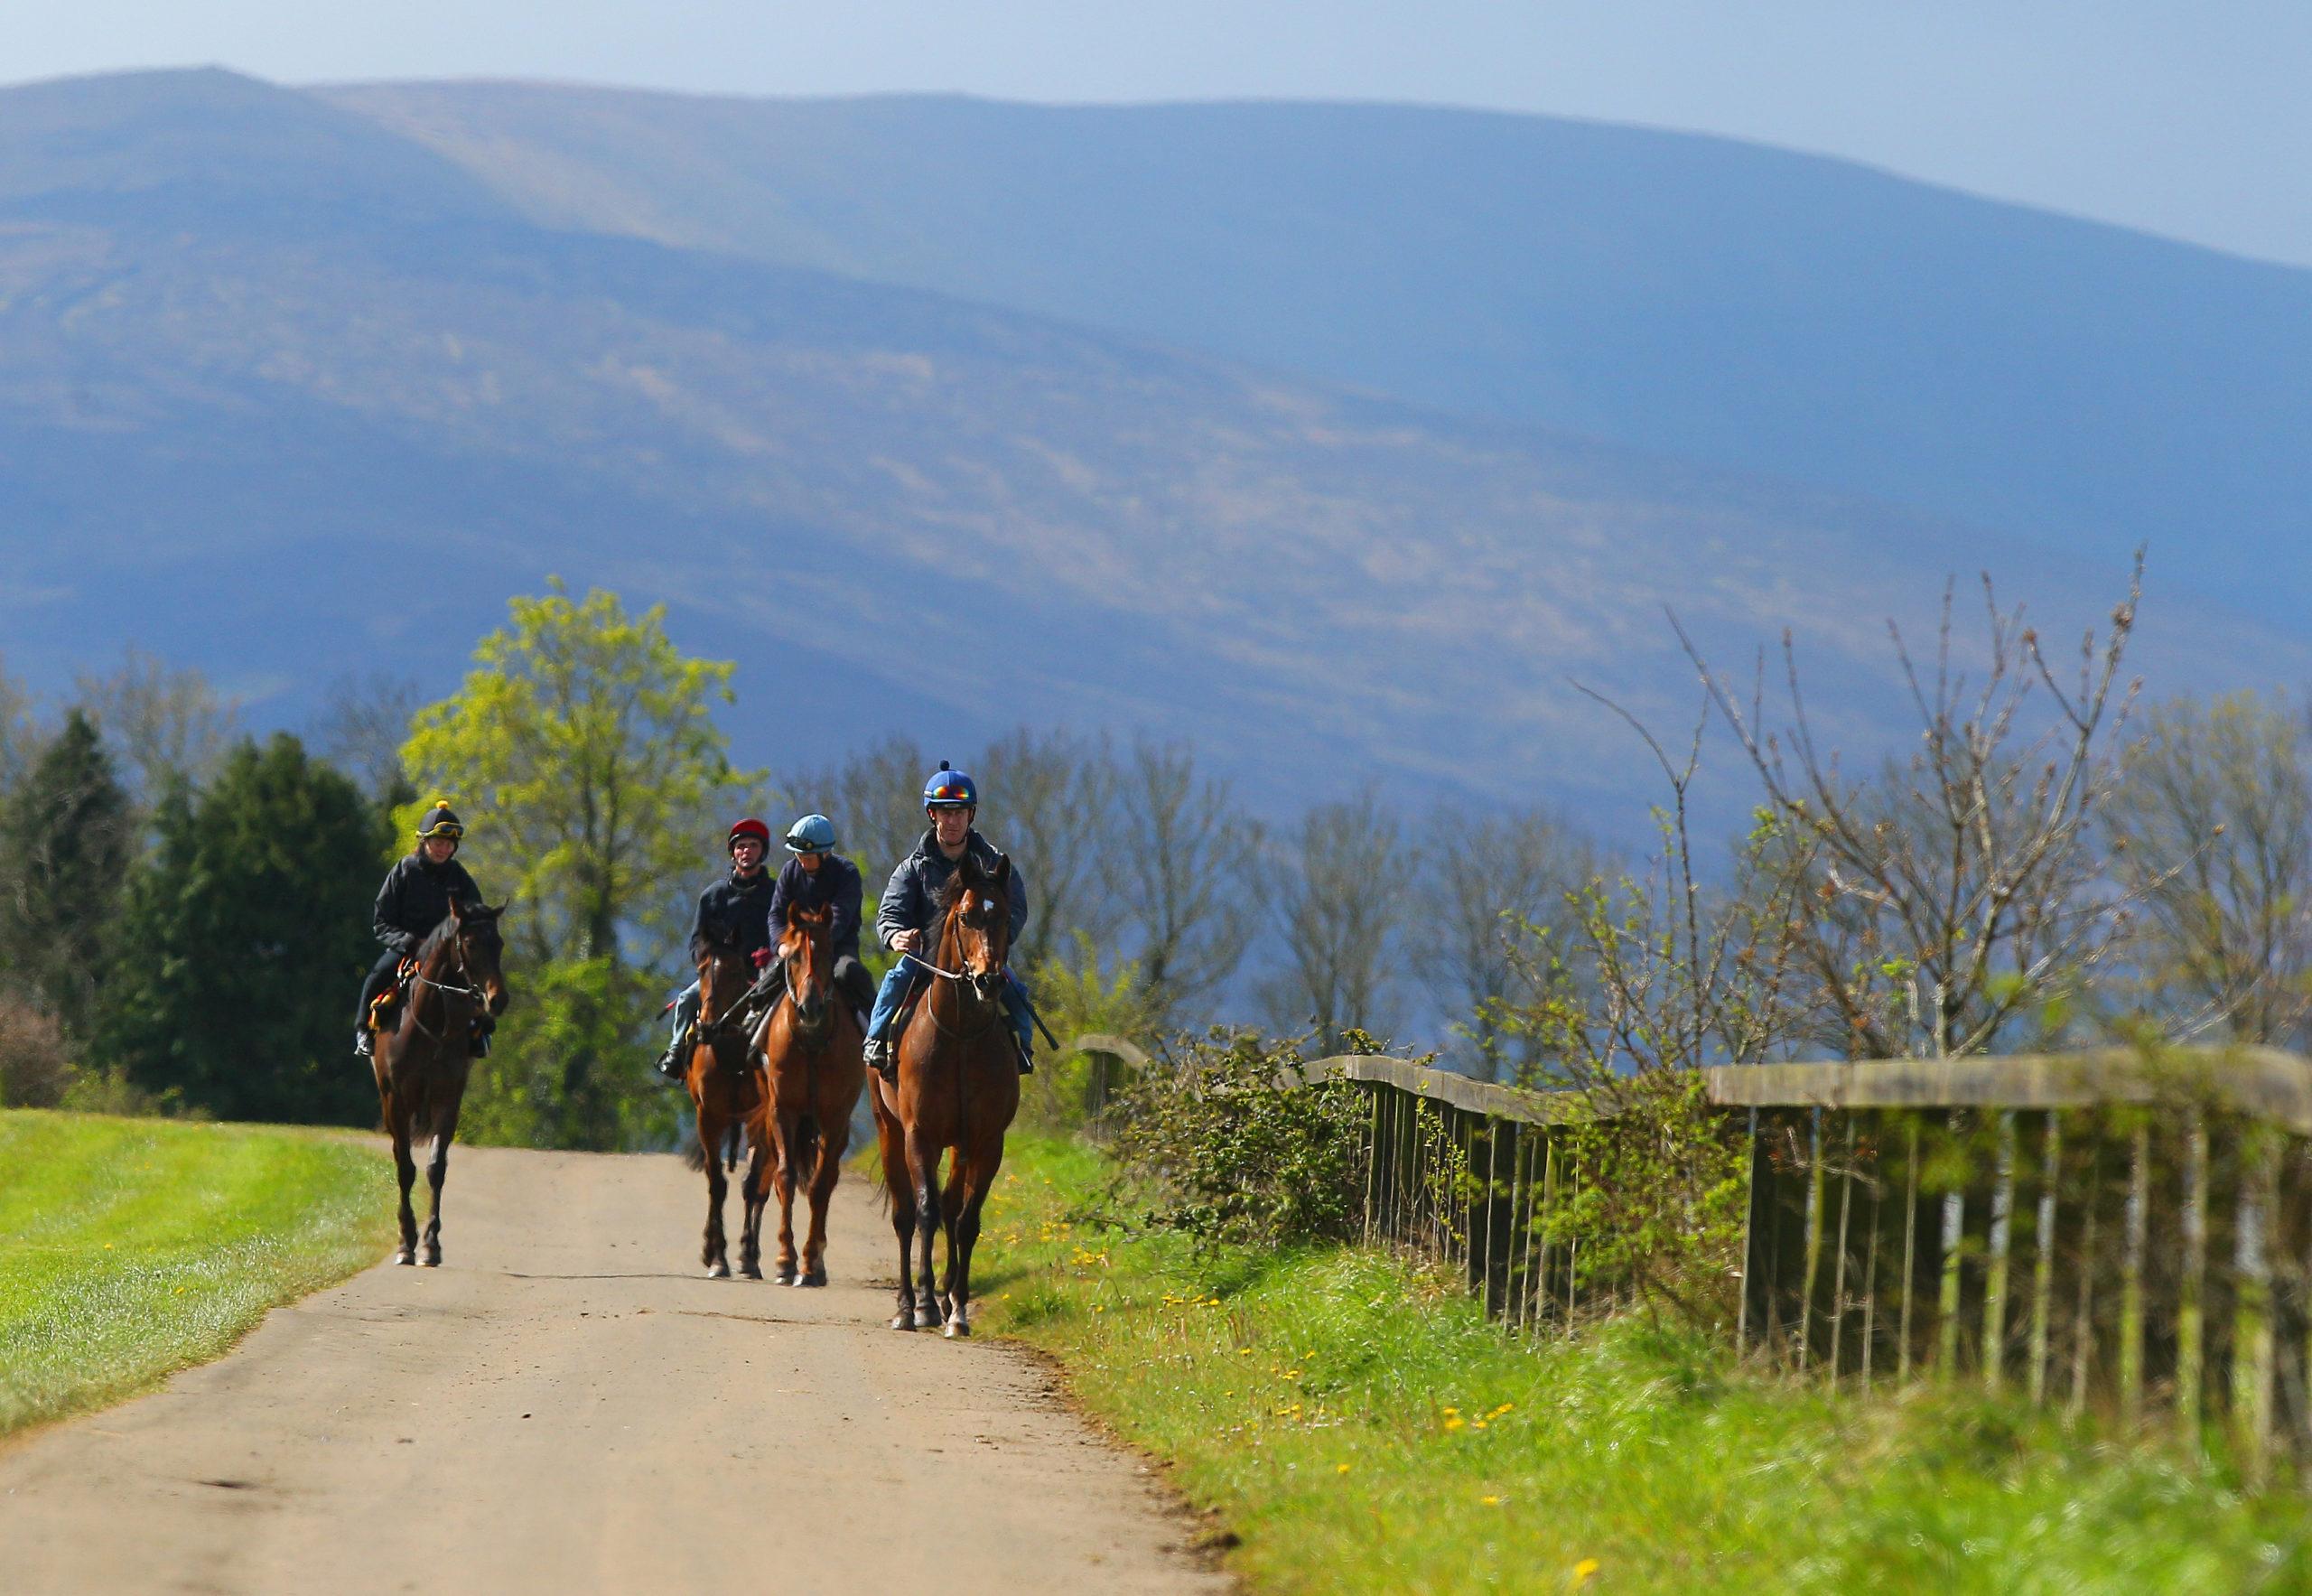 Irish Gardens, Houses & Horses: The Inside Track